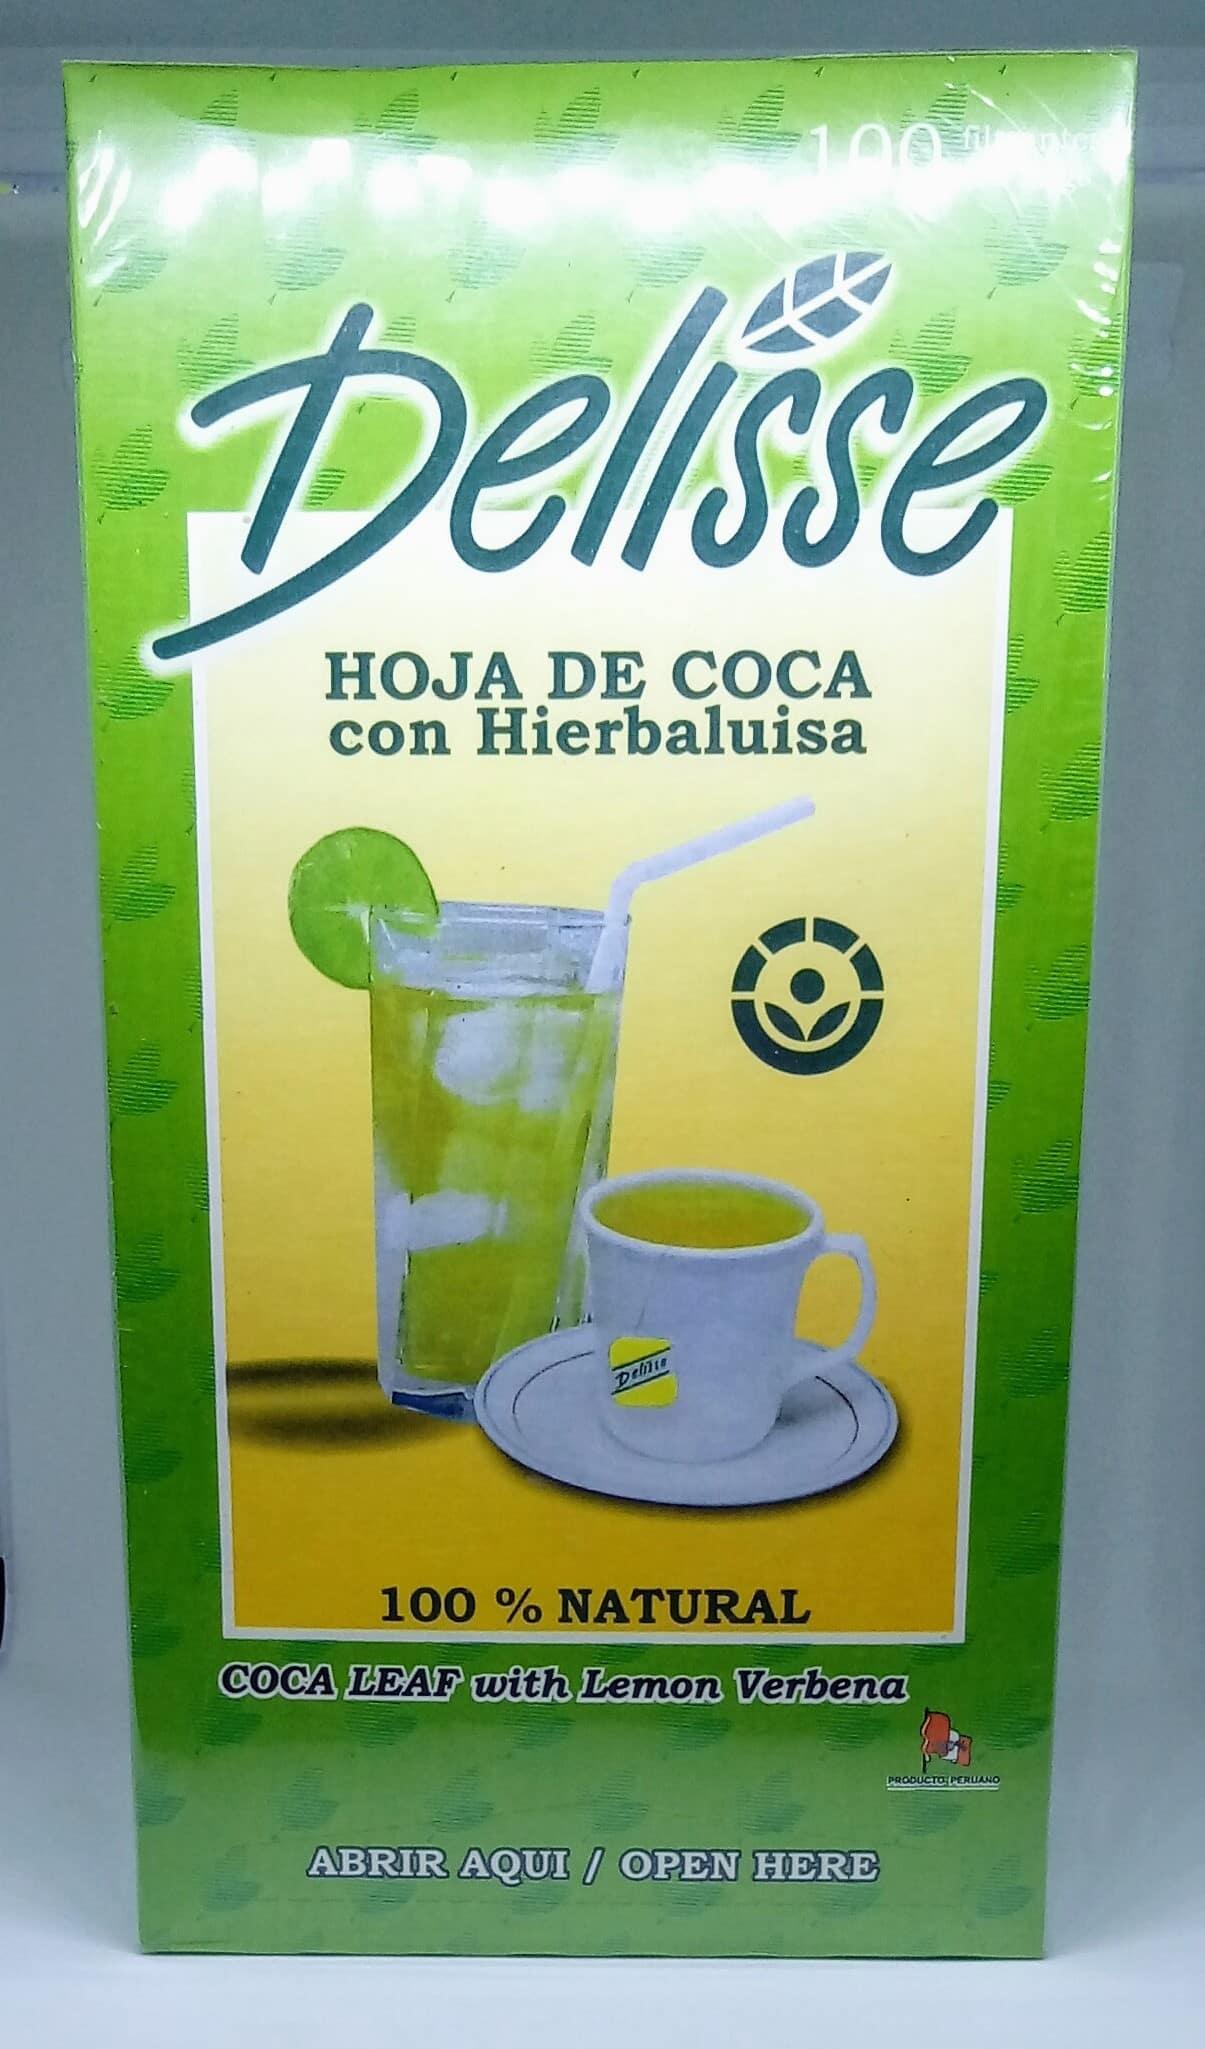 Coca Tea for Sale - Buy 100% Natural Leaves, Tea, Powder